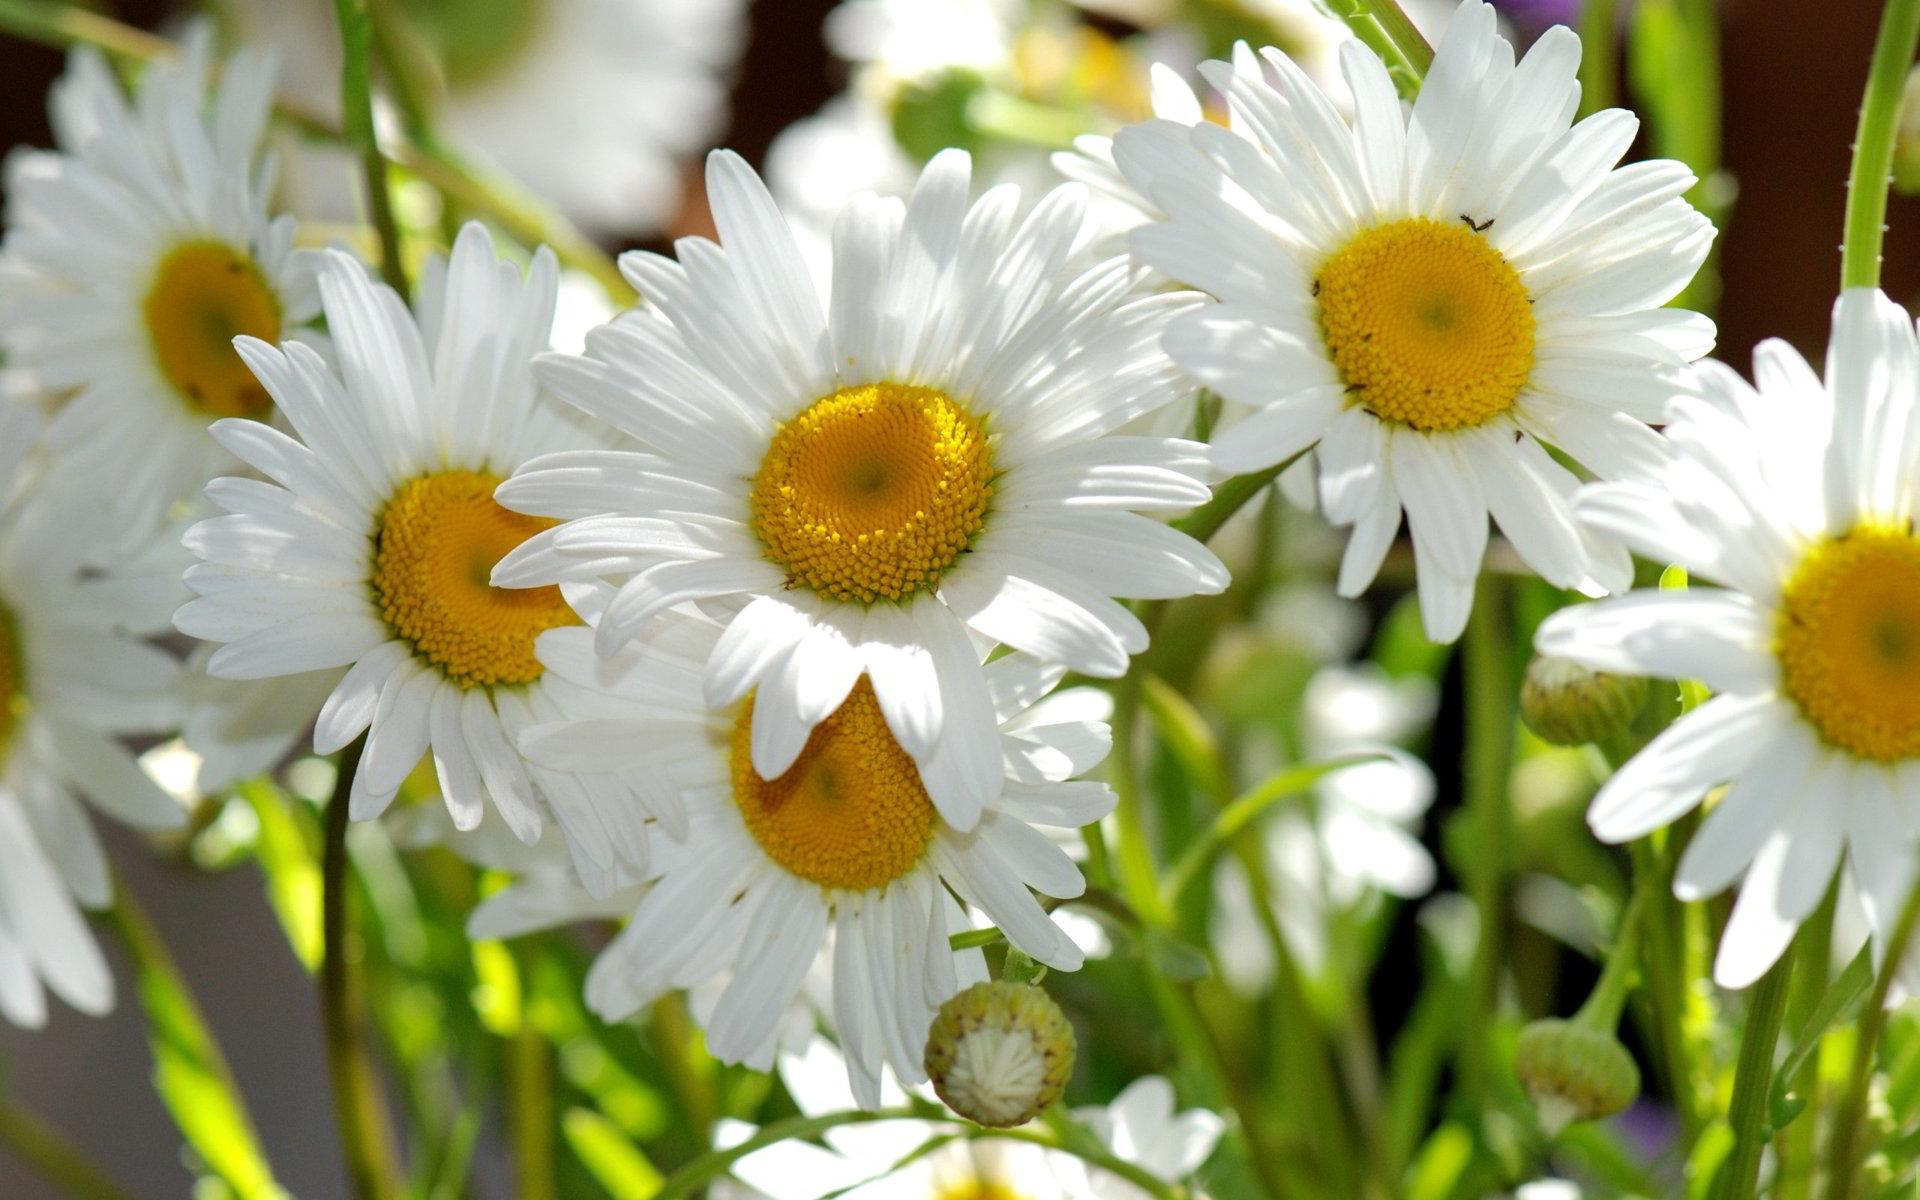 hinh anh hoa cuc dep 31